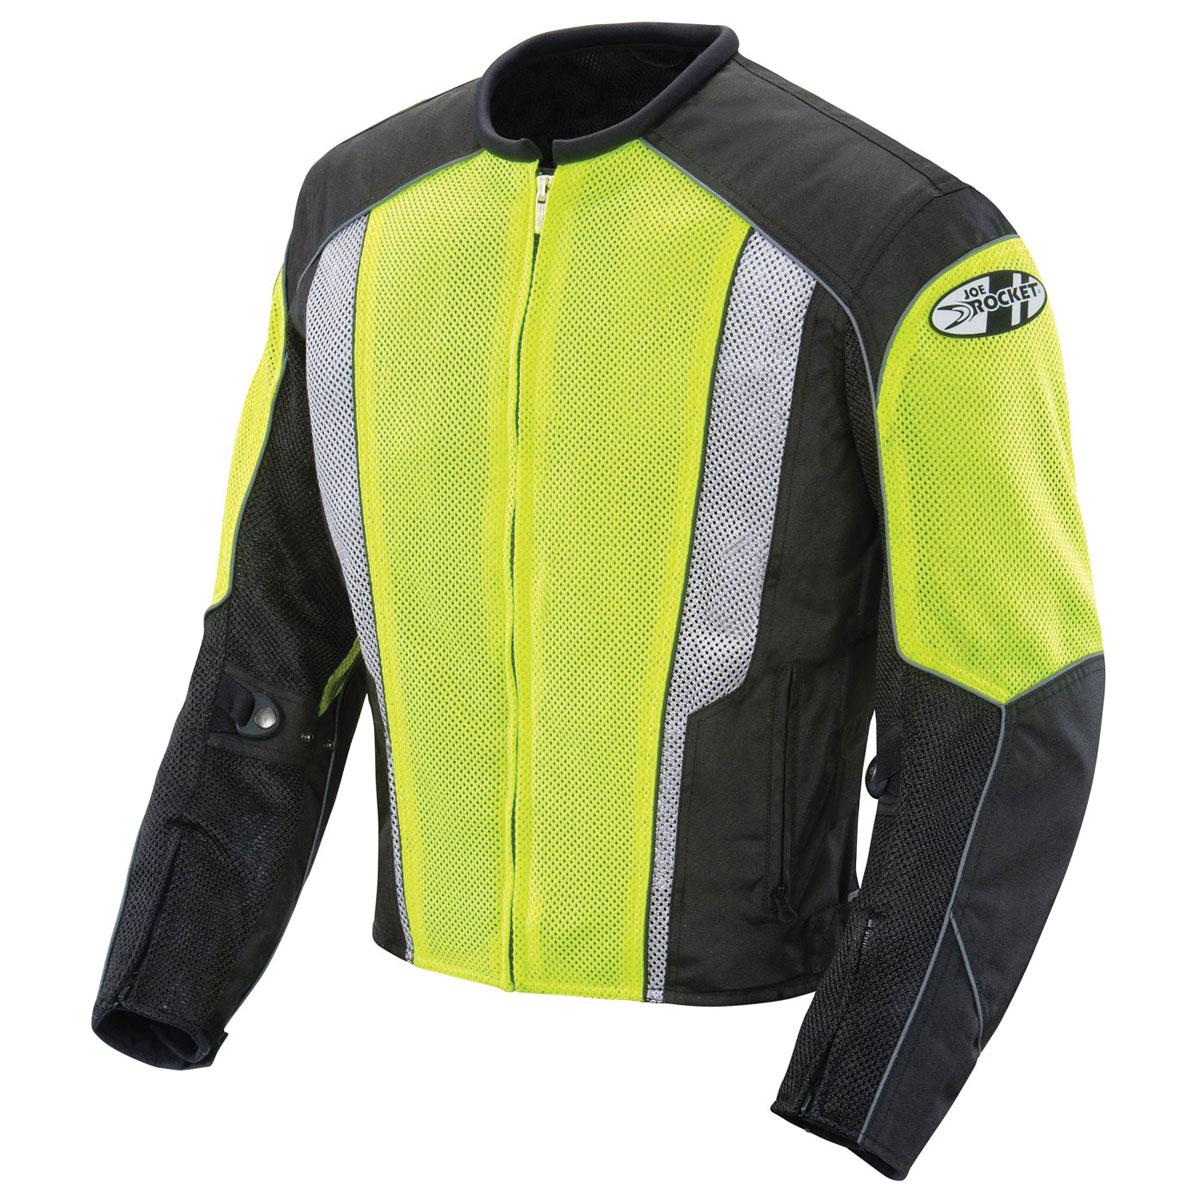 Joe Rocket Men's Phoenix 5.0 Neon/Black Mesh Jacket